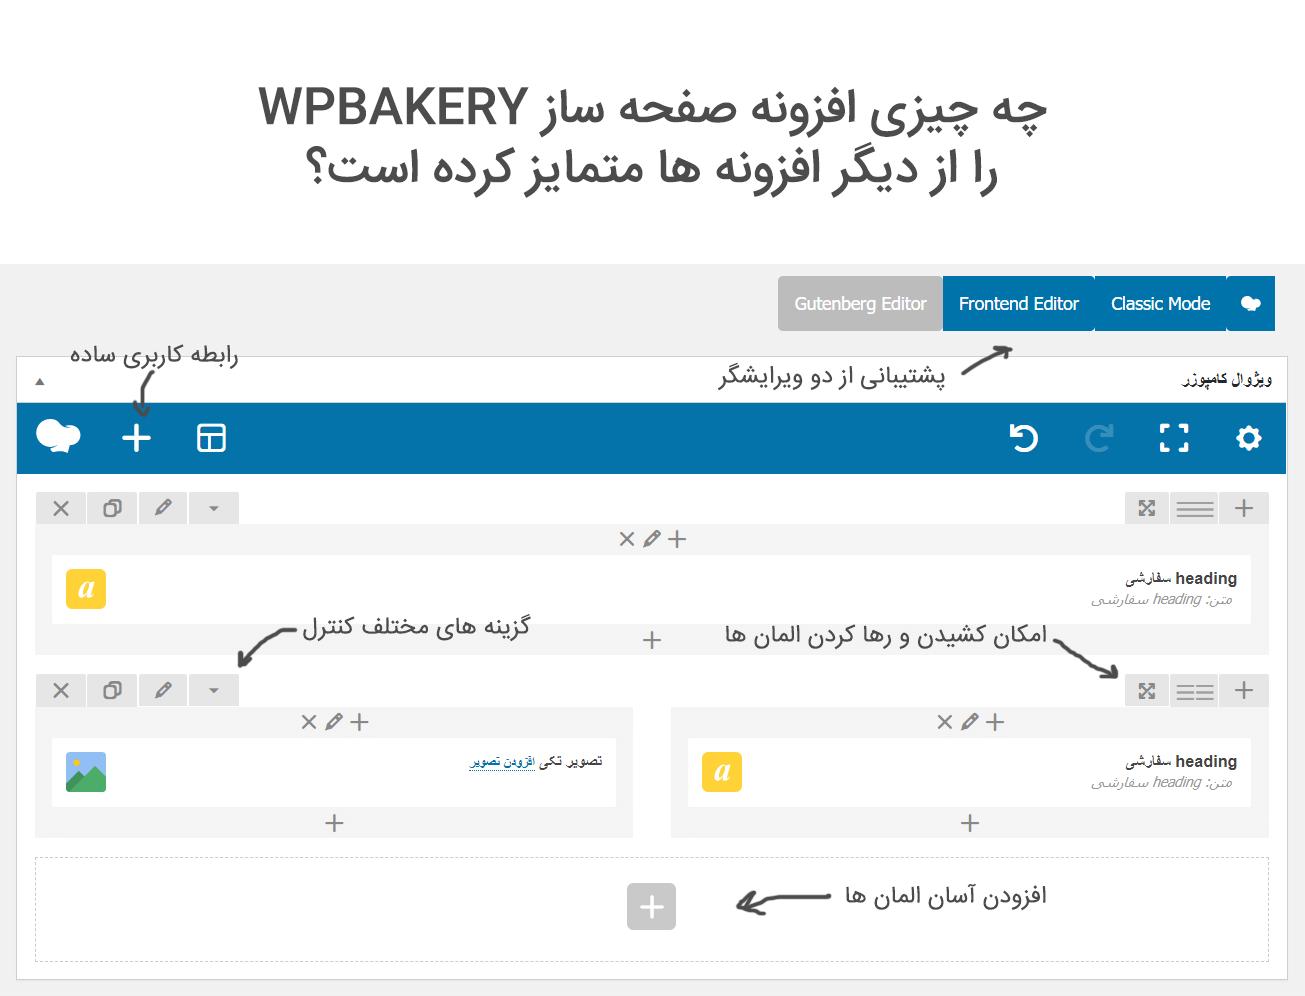 افزونه ویژوال کامپوزر | WPBakery Page Builder | ویژوال کامپوسر | Visual Composer | صفحه ساز ویژوال | WPbakery Visual Composer